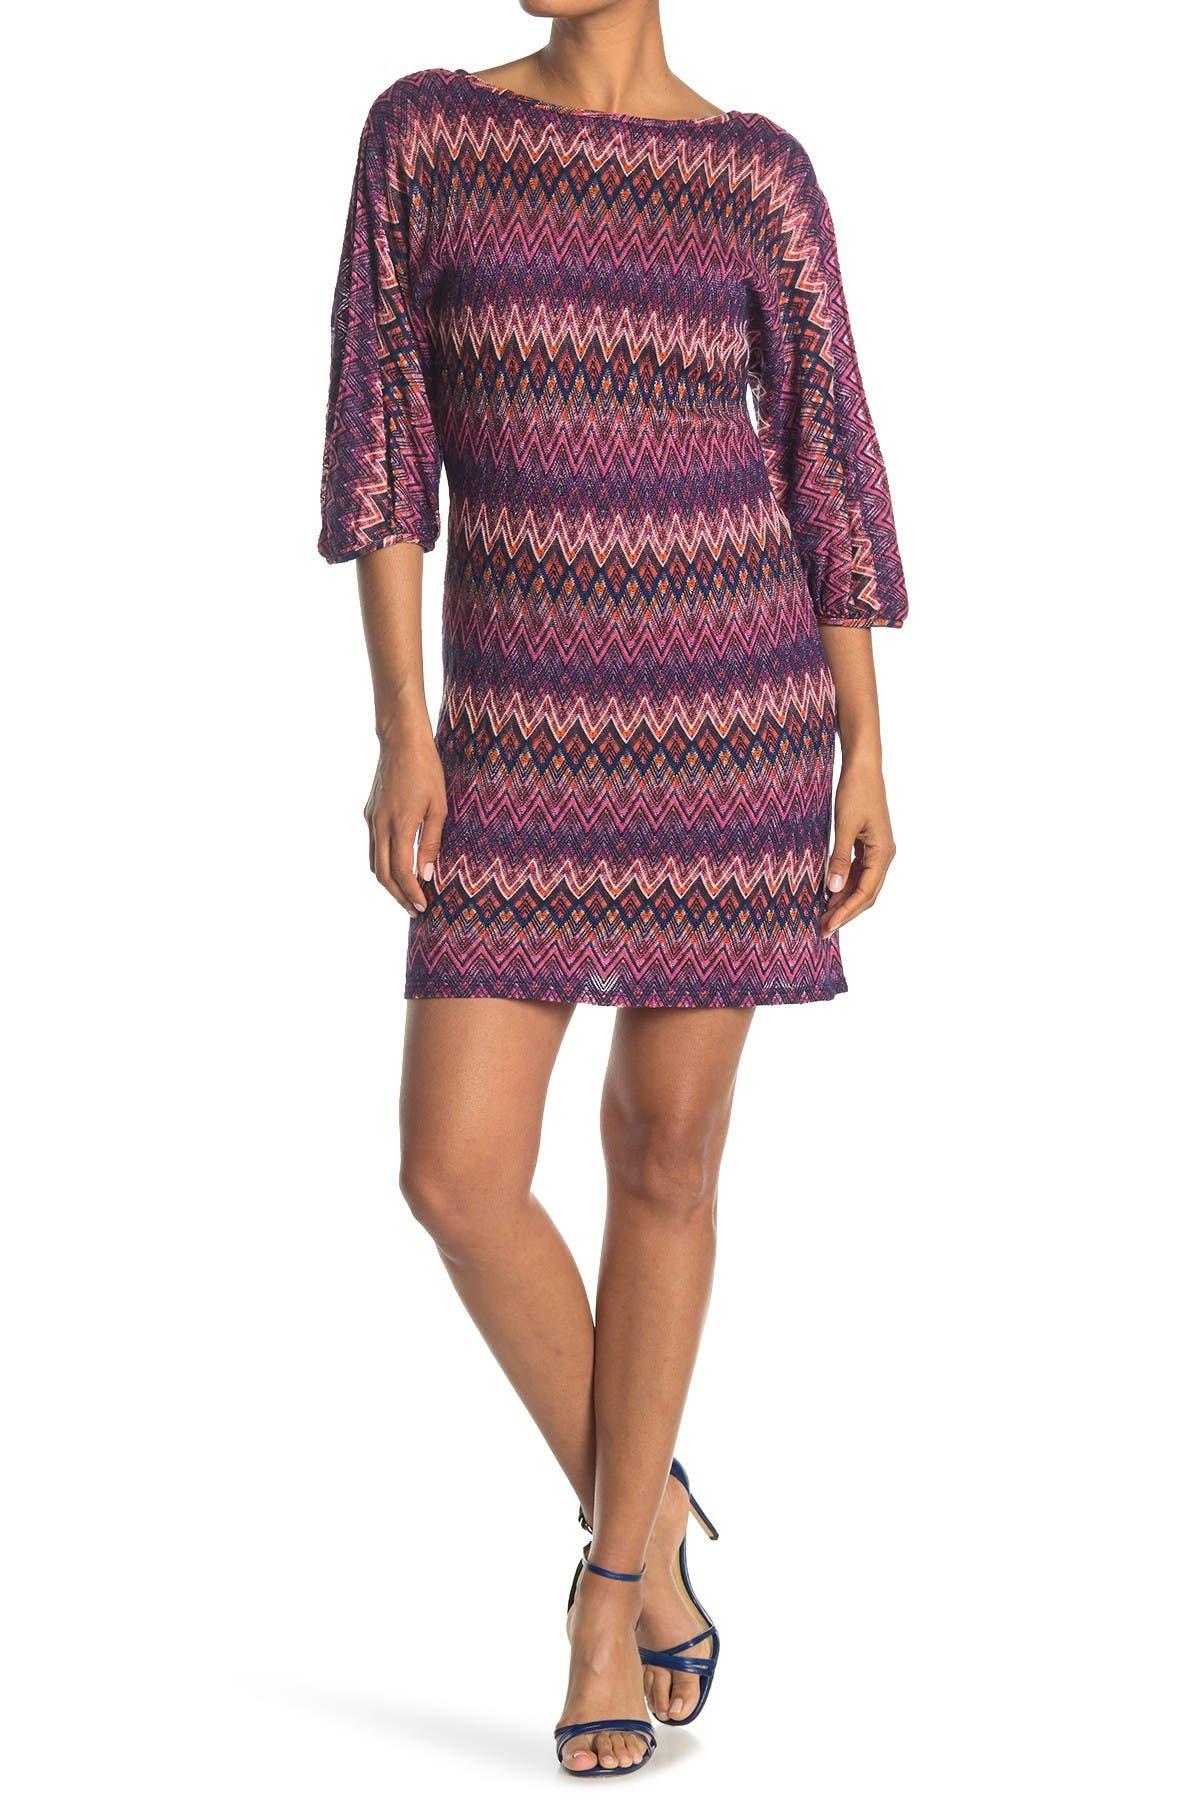 Image of Trina Turk Nature Pattern Quarter Sleeve Dress